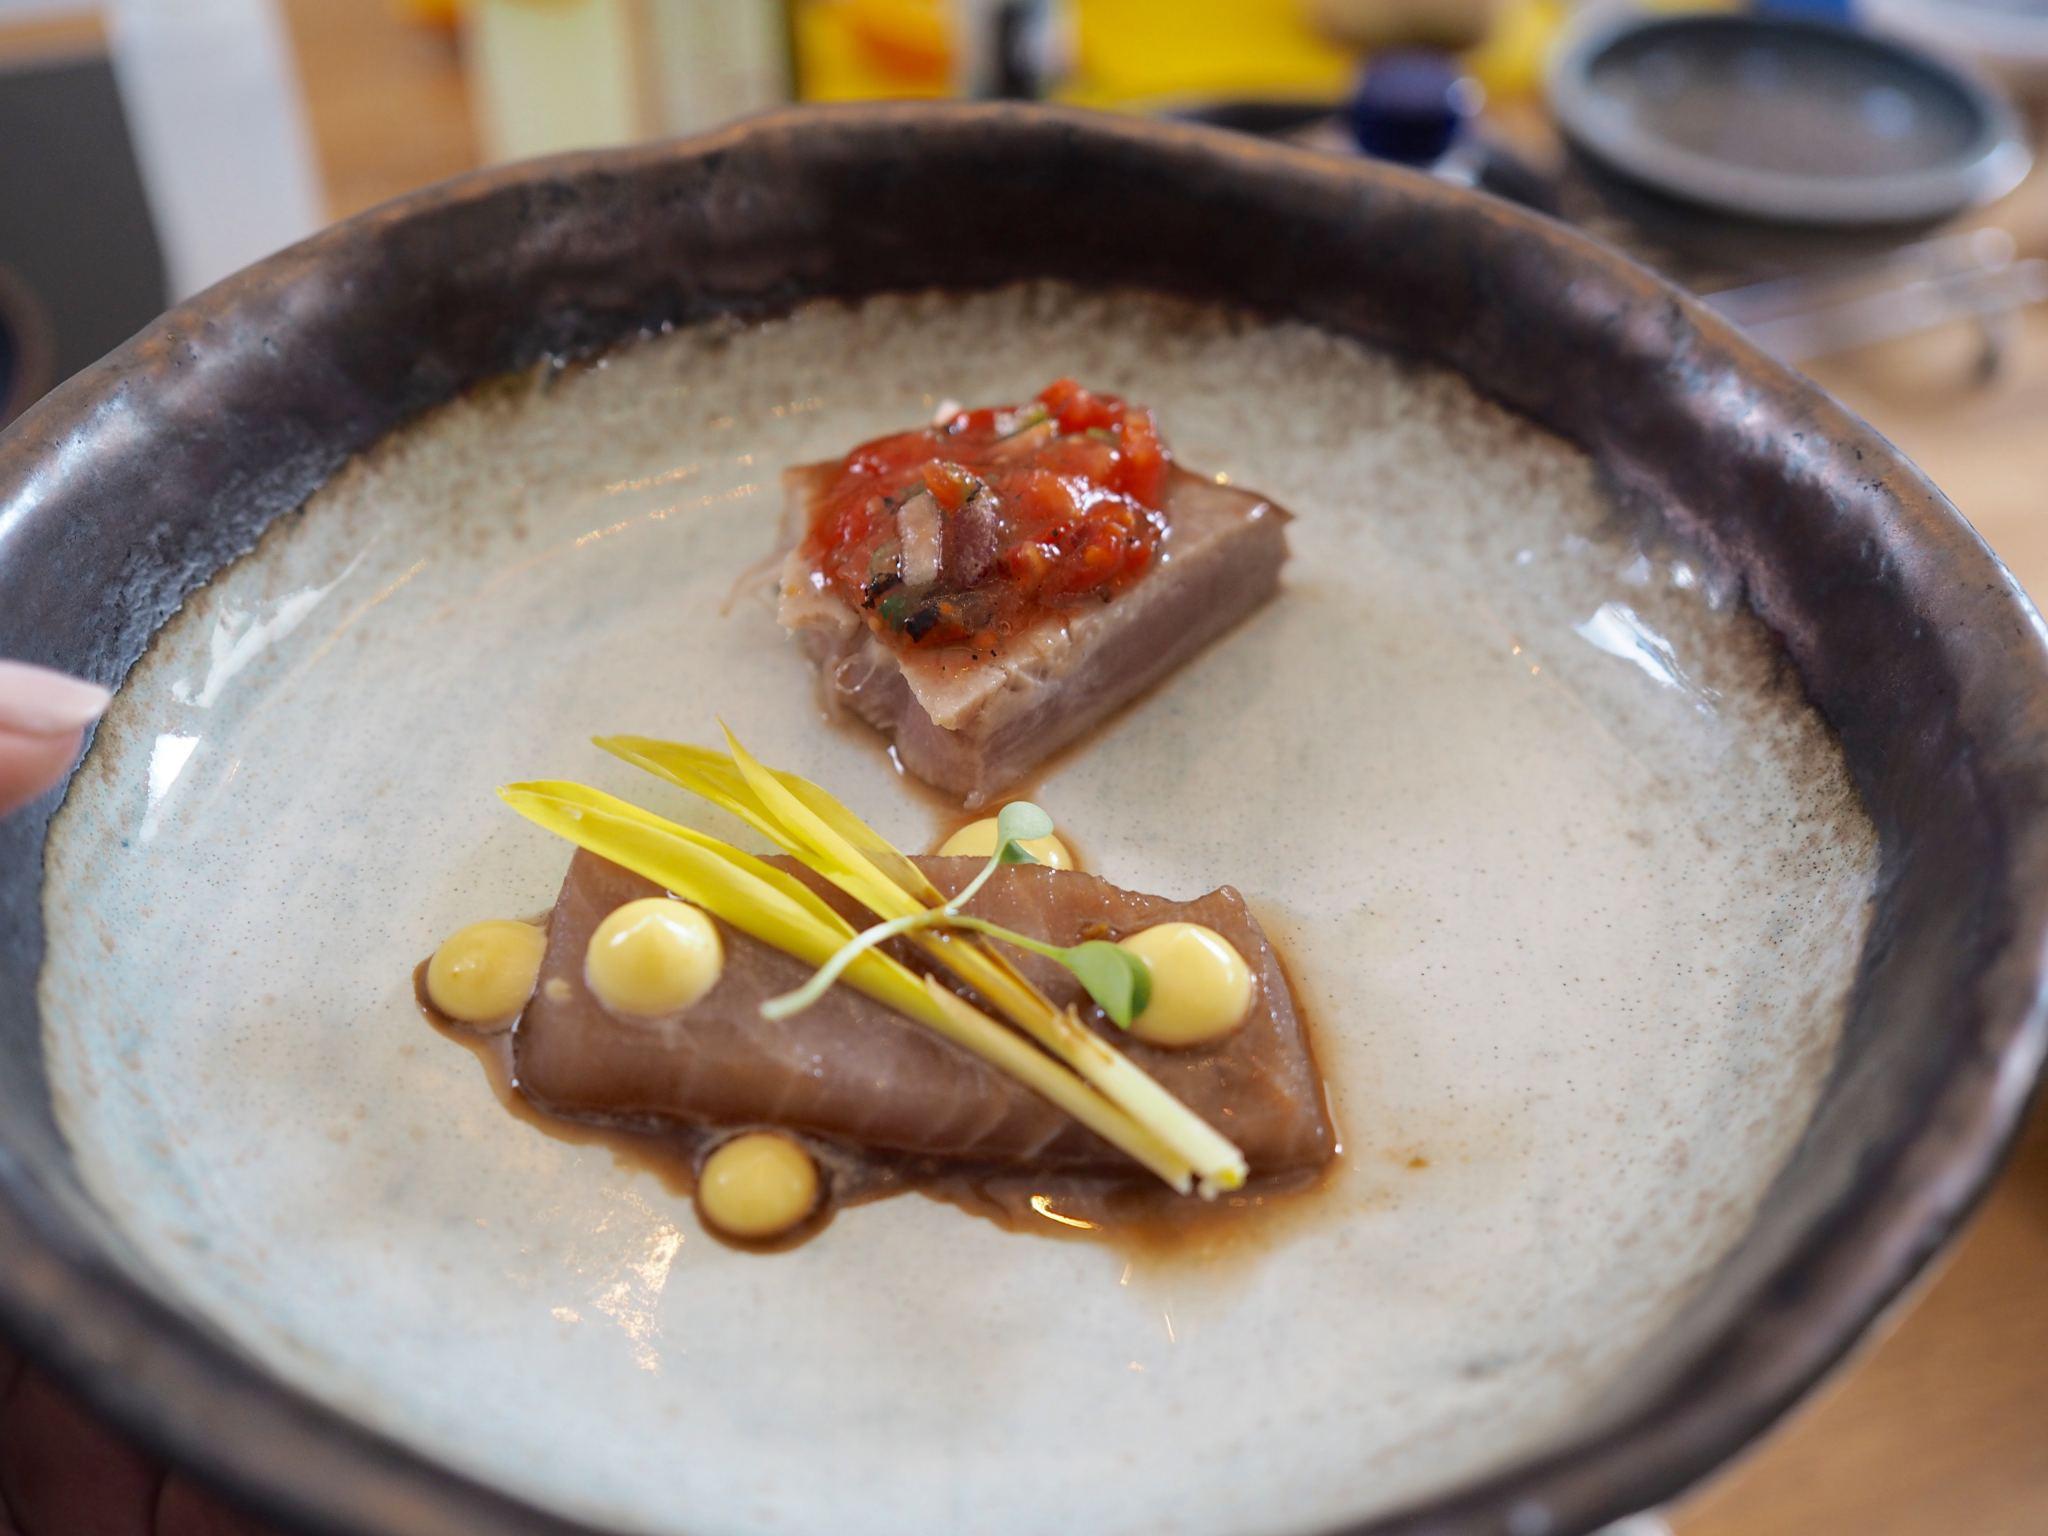 Chelsea Iceland School of fish cooking school neil nugent tuna sashimi